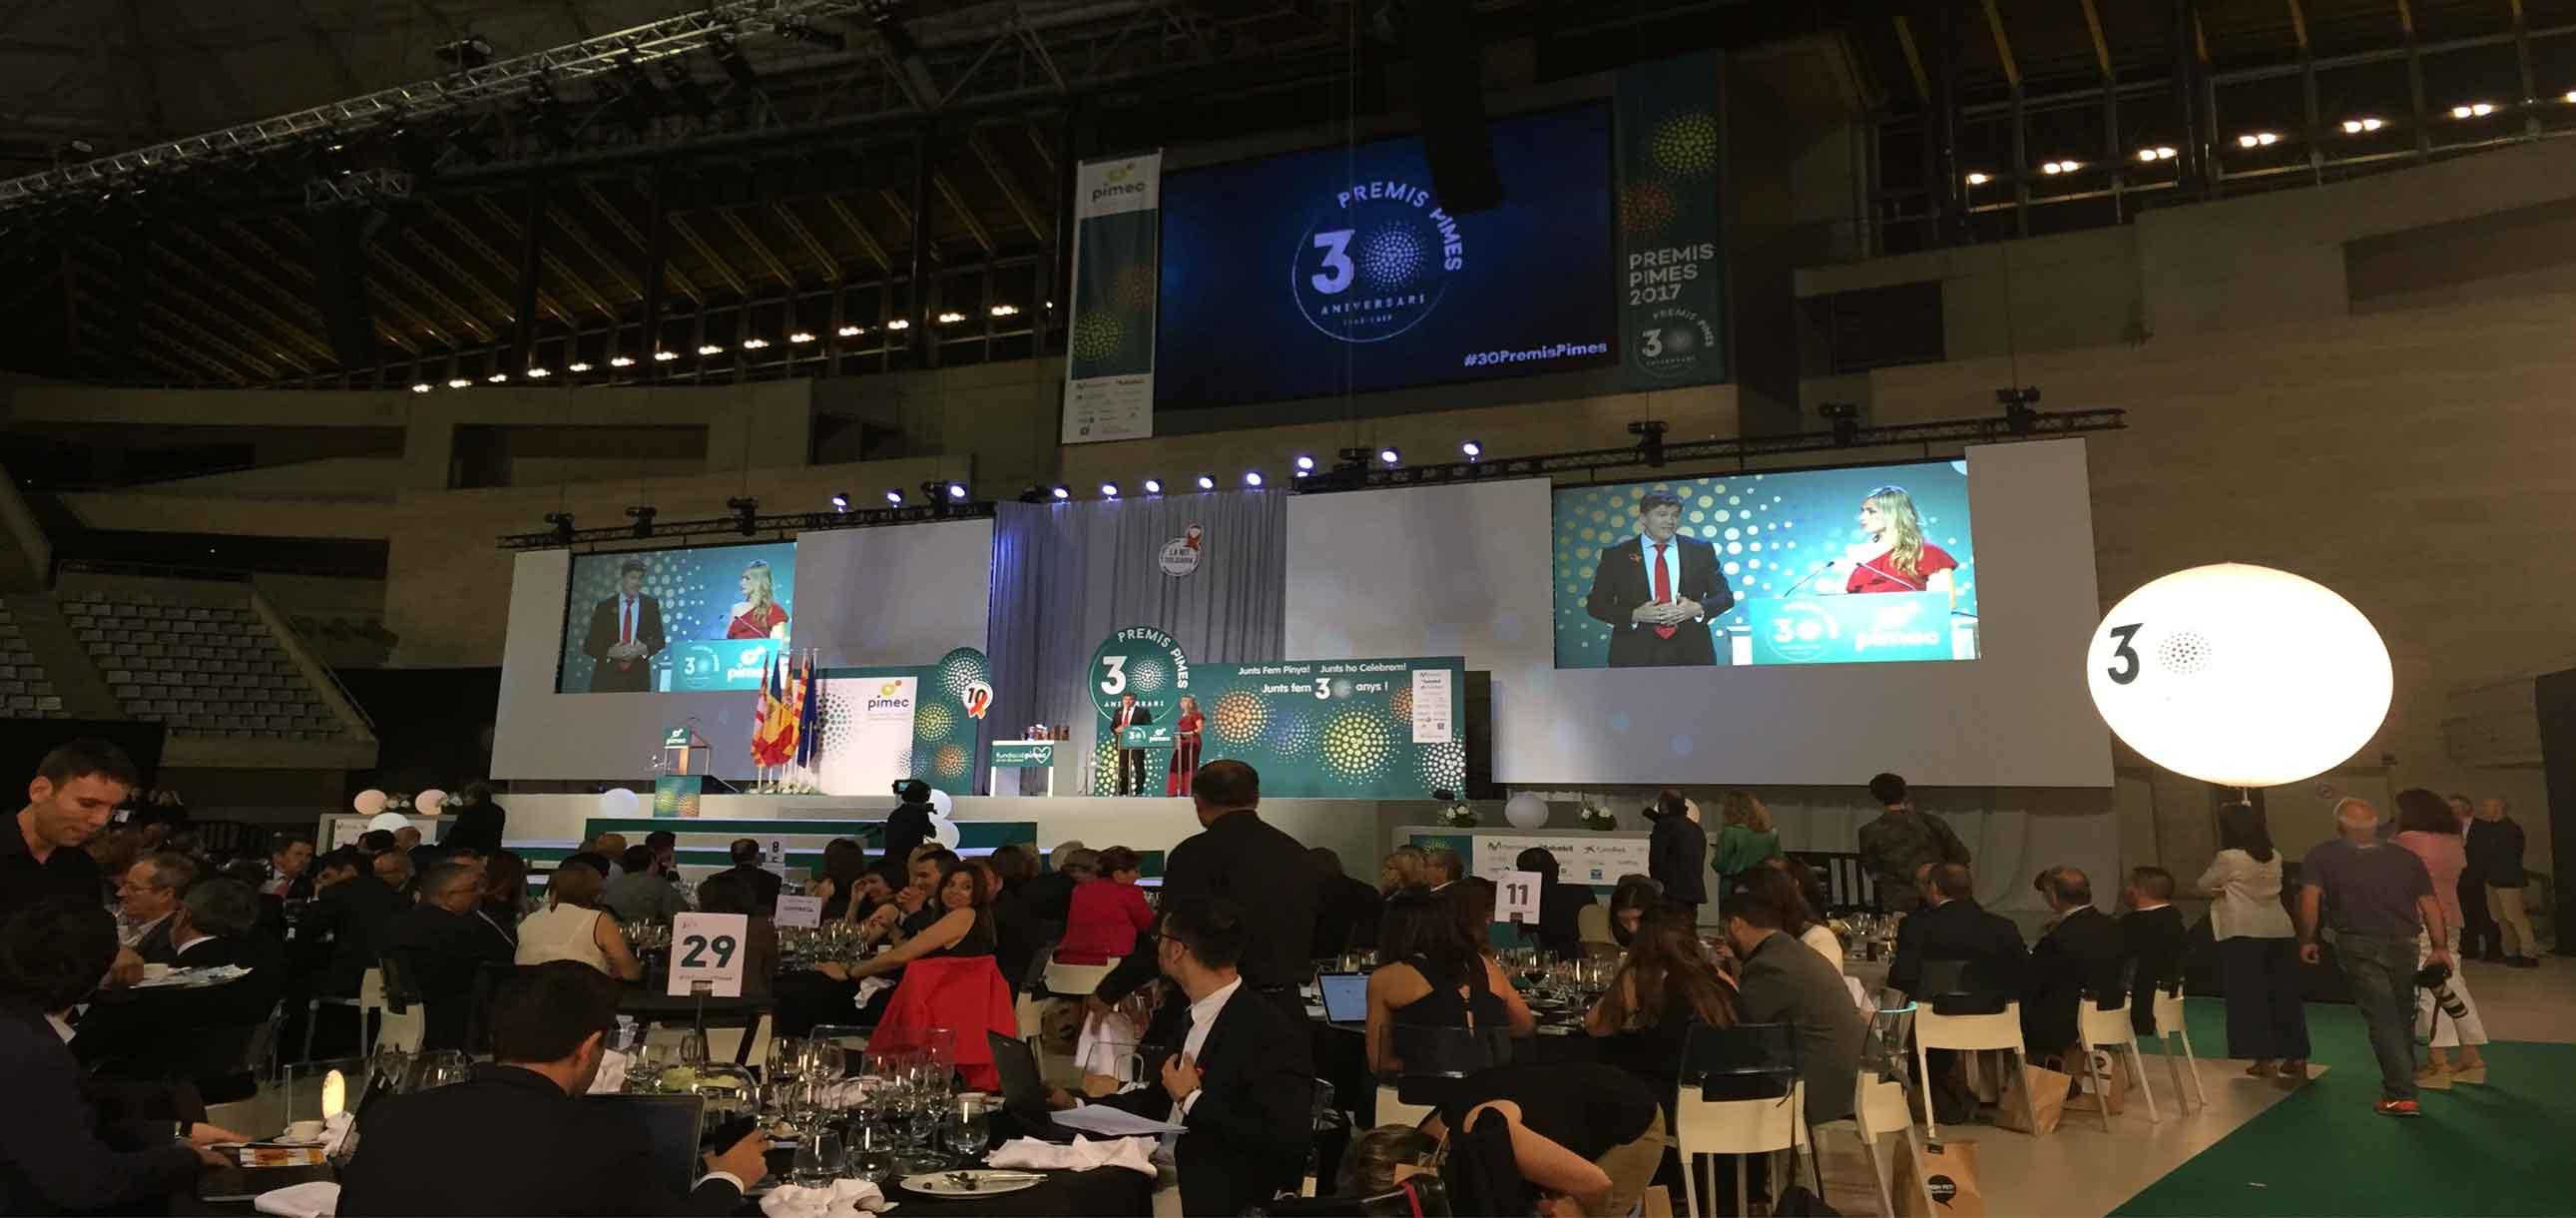 Premios Pimes<br />30 aniversario